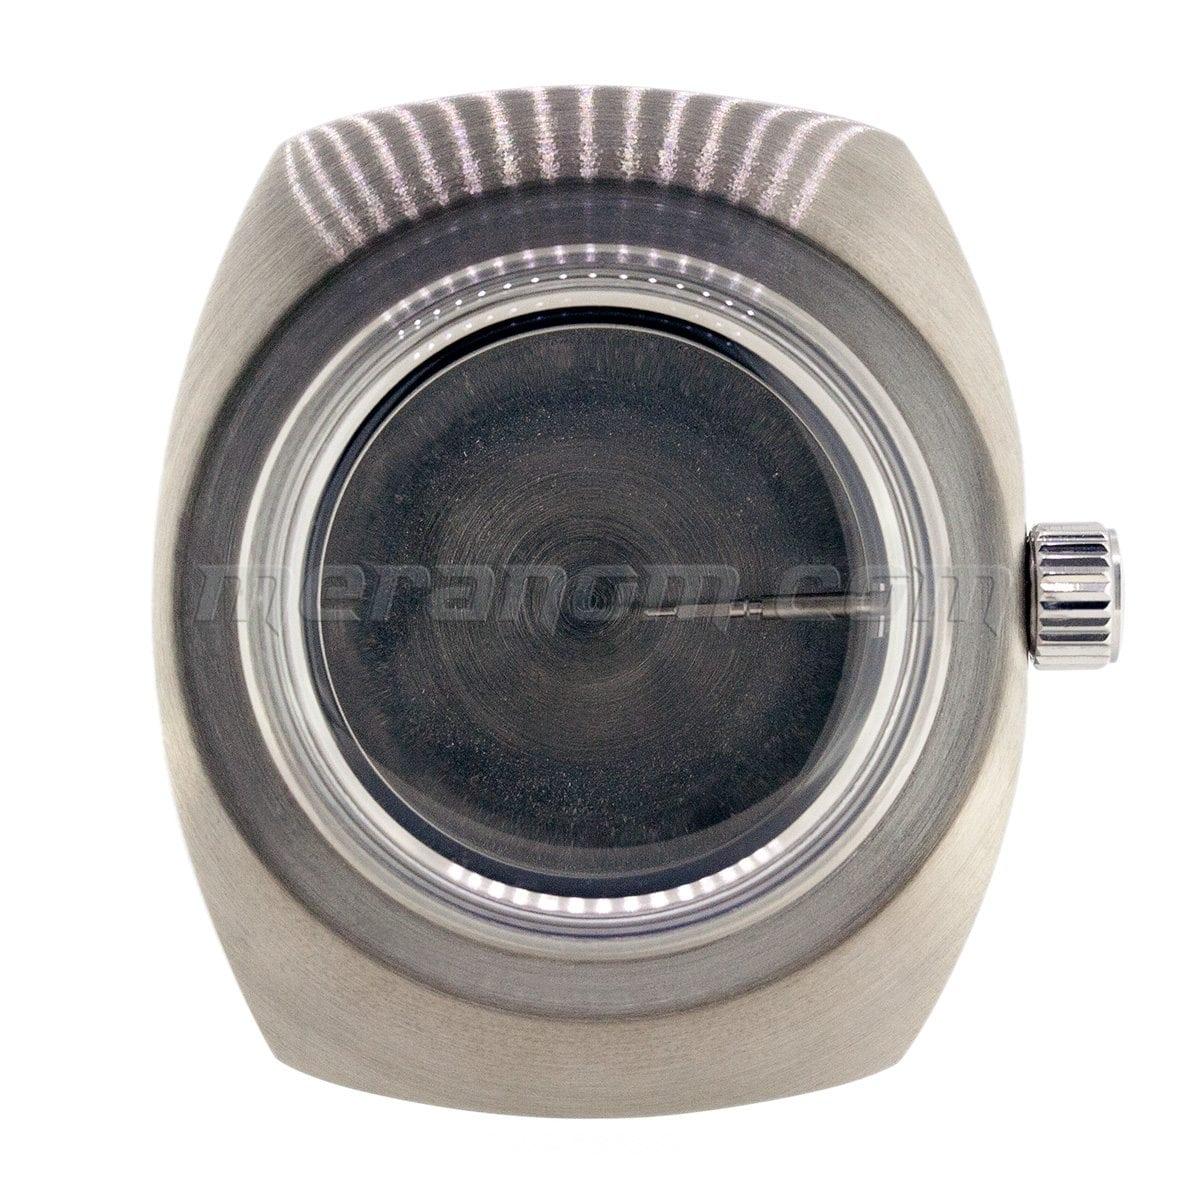 Vostok Relojes Case 090 Brushed Compra A Un Distribuidor